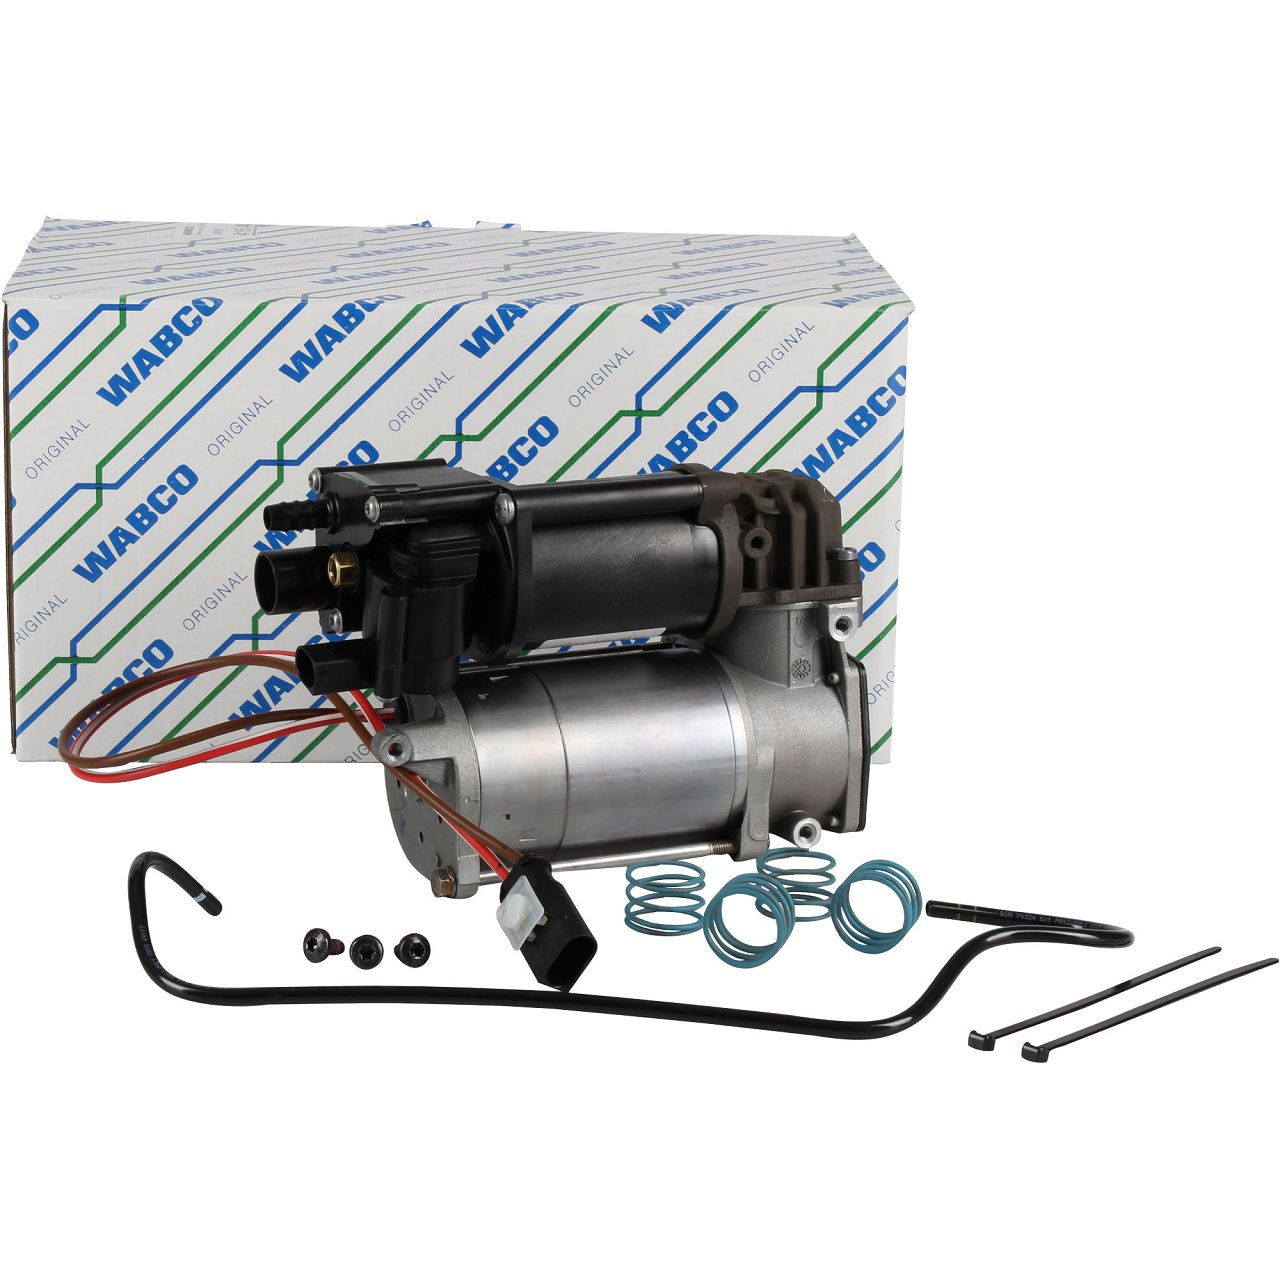 WABCO Kompressor Luftfederung Luftkompressor für BMW 5er F07 F11 7er F01-04